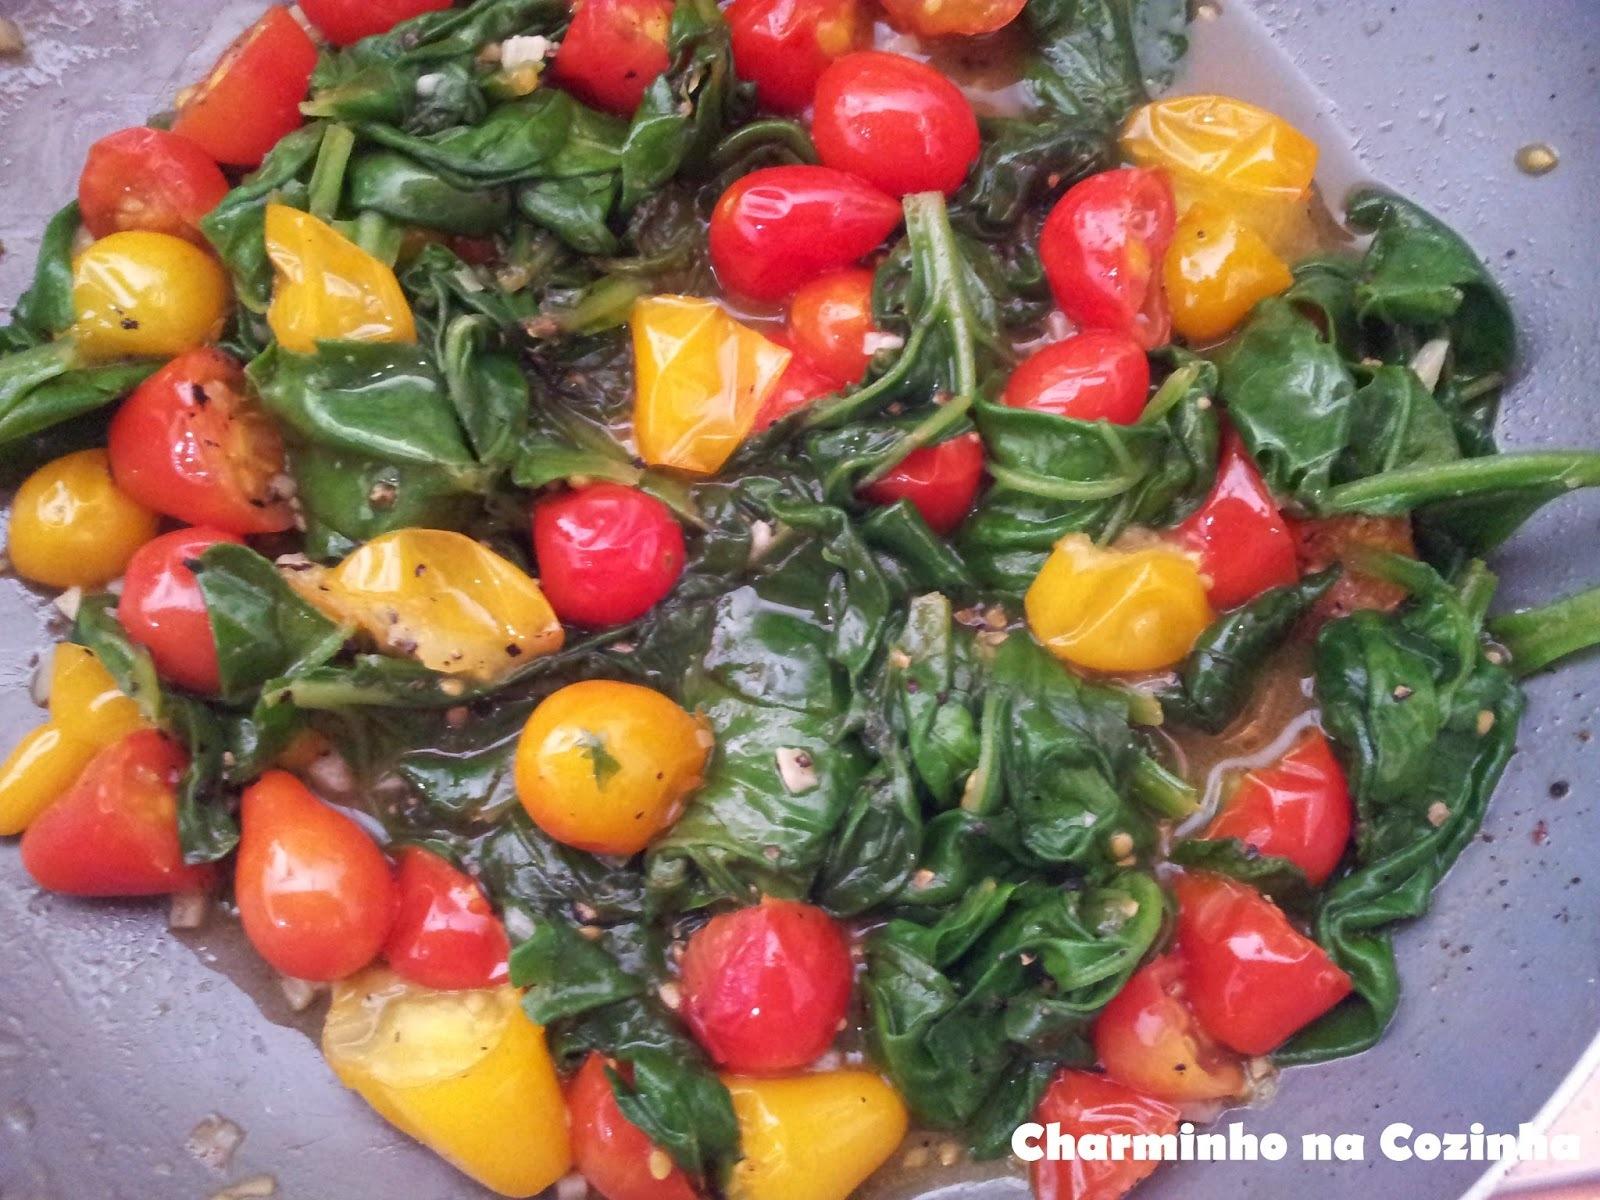 Salada quente de espinafre e tomatinhos